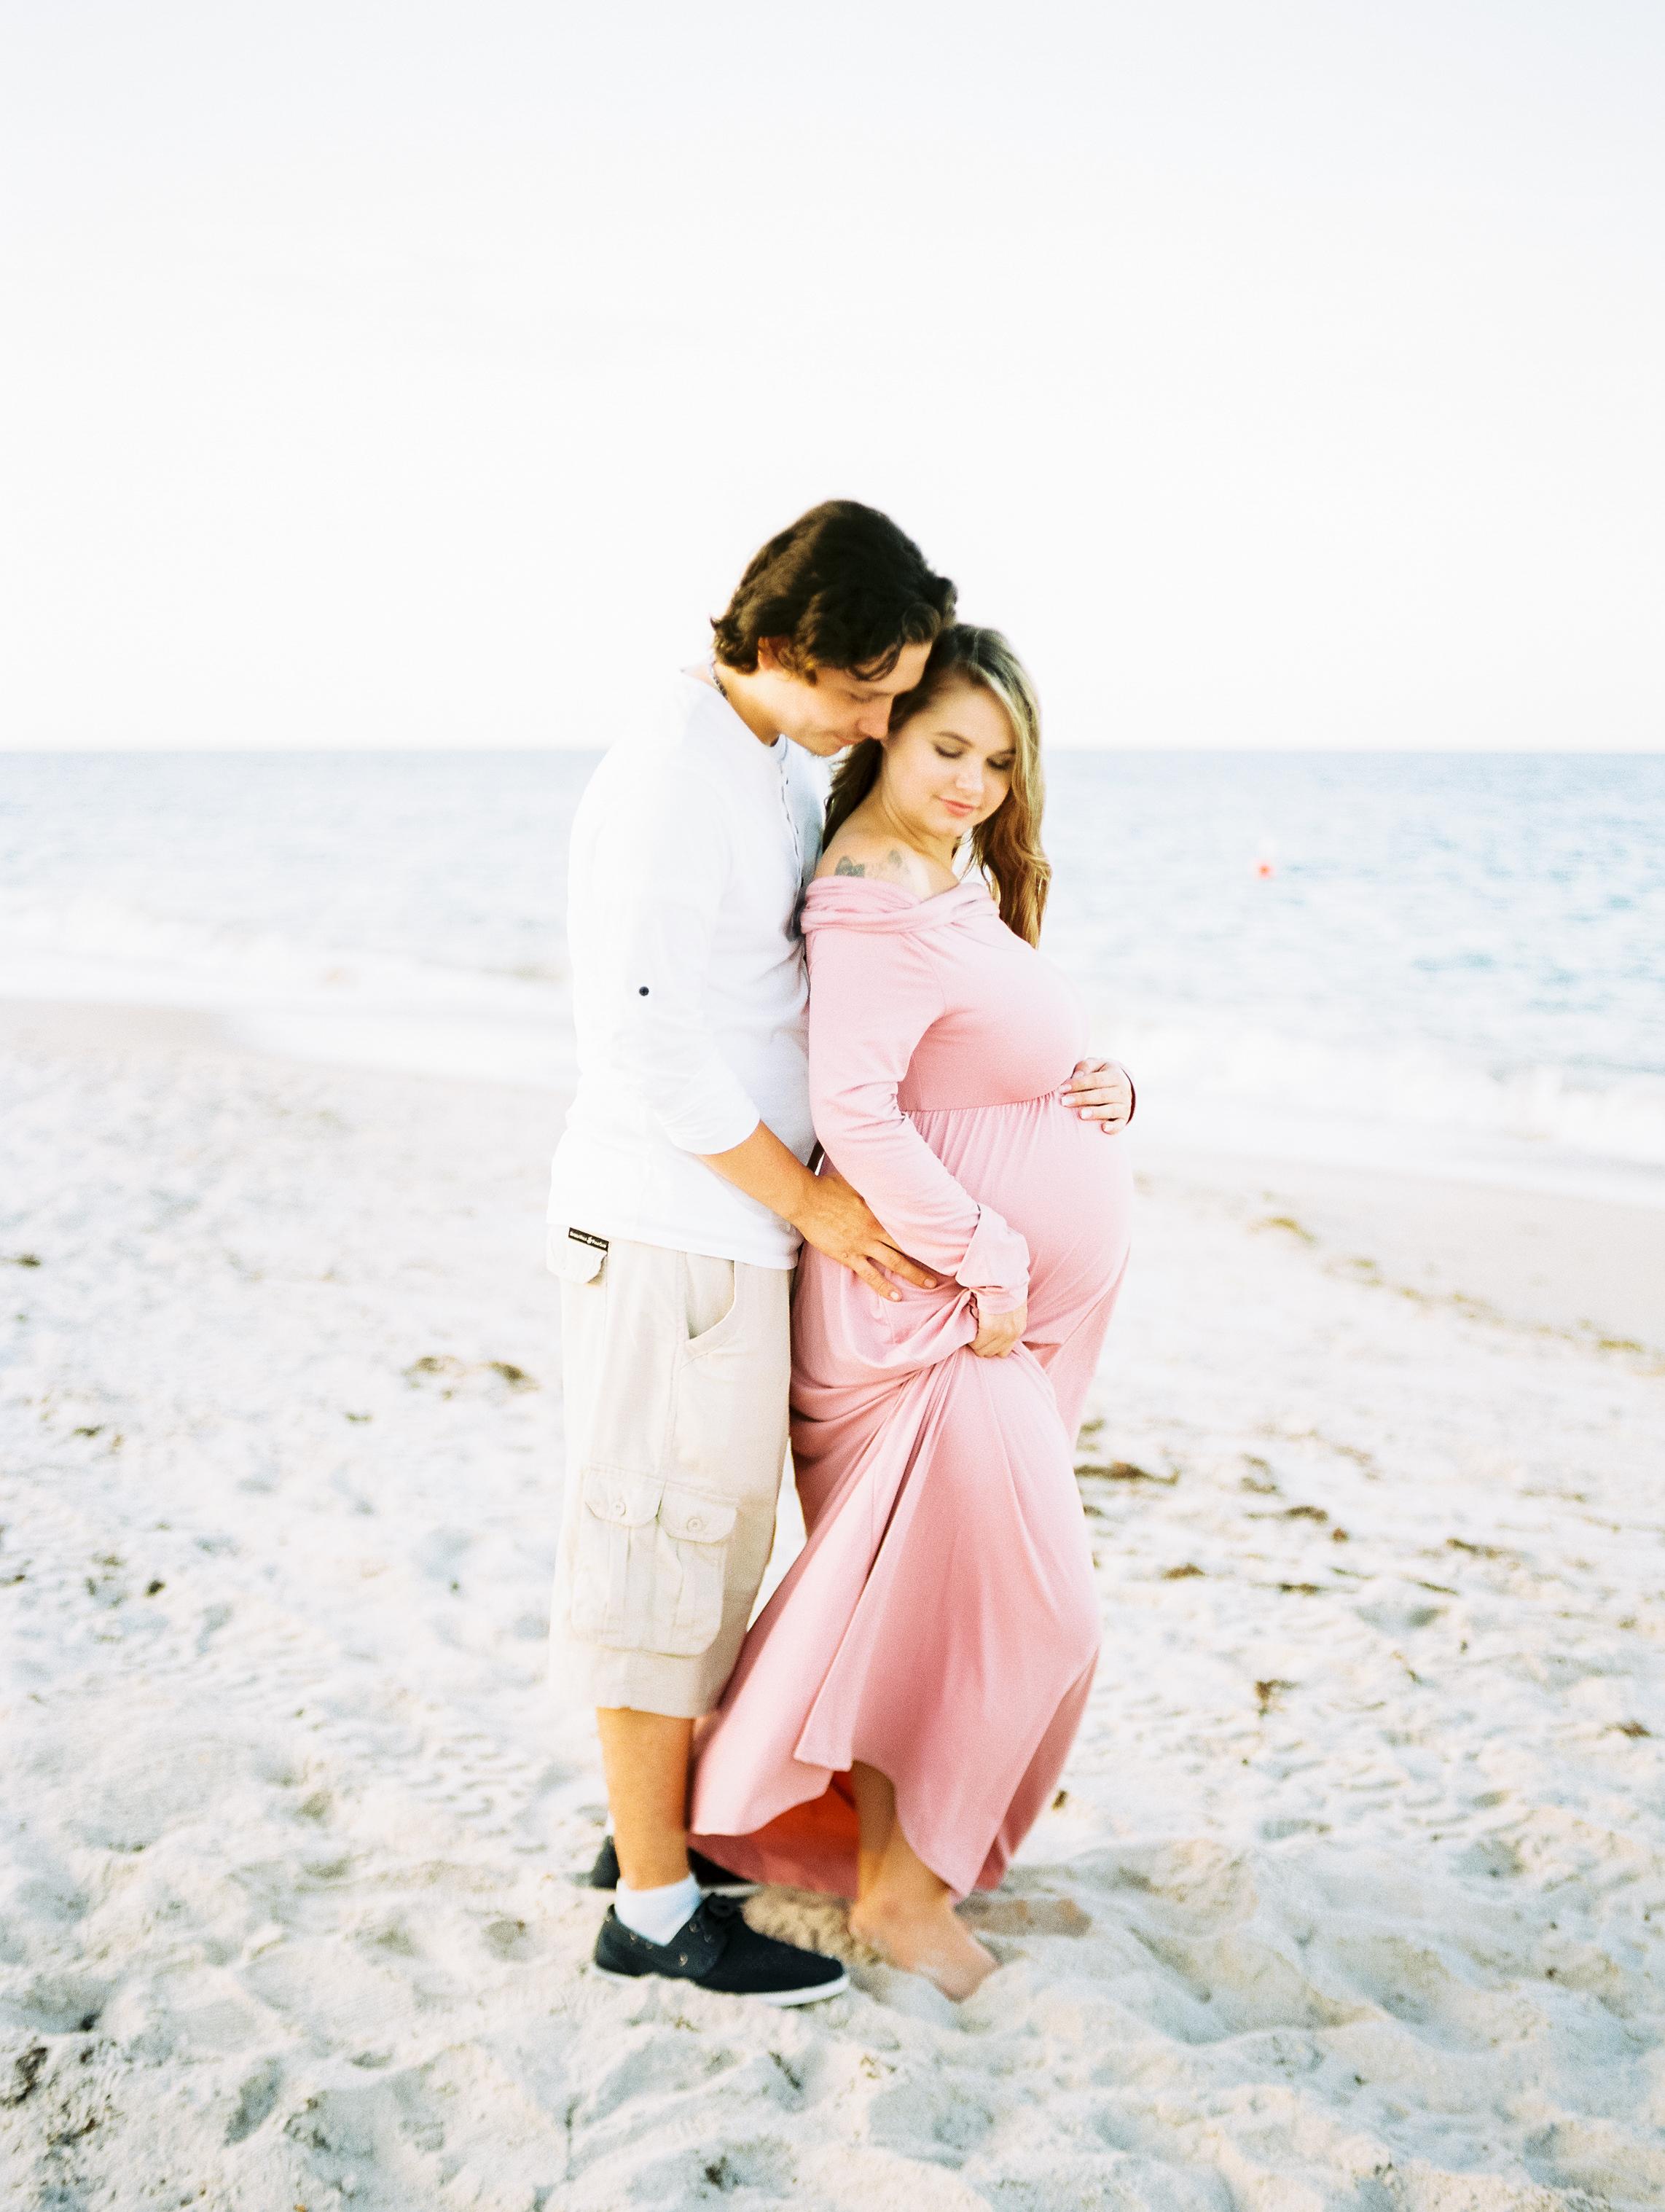 kaylee_maternity_faves-10.jpg